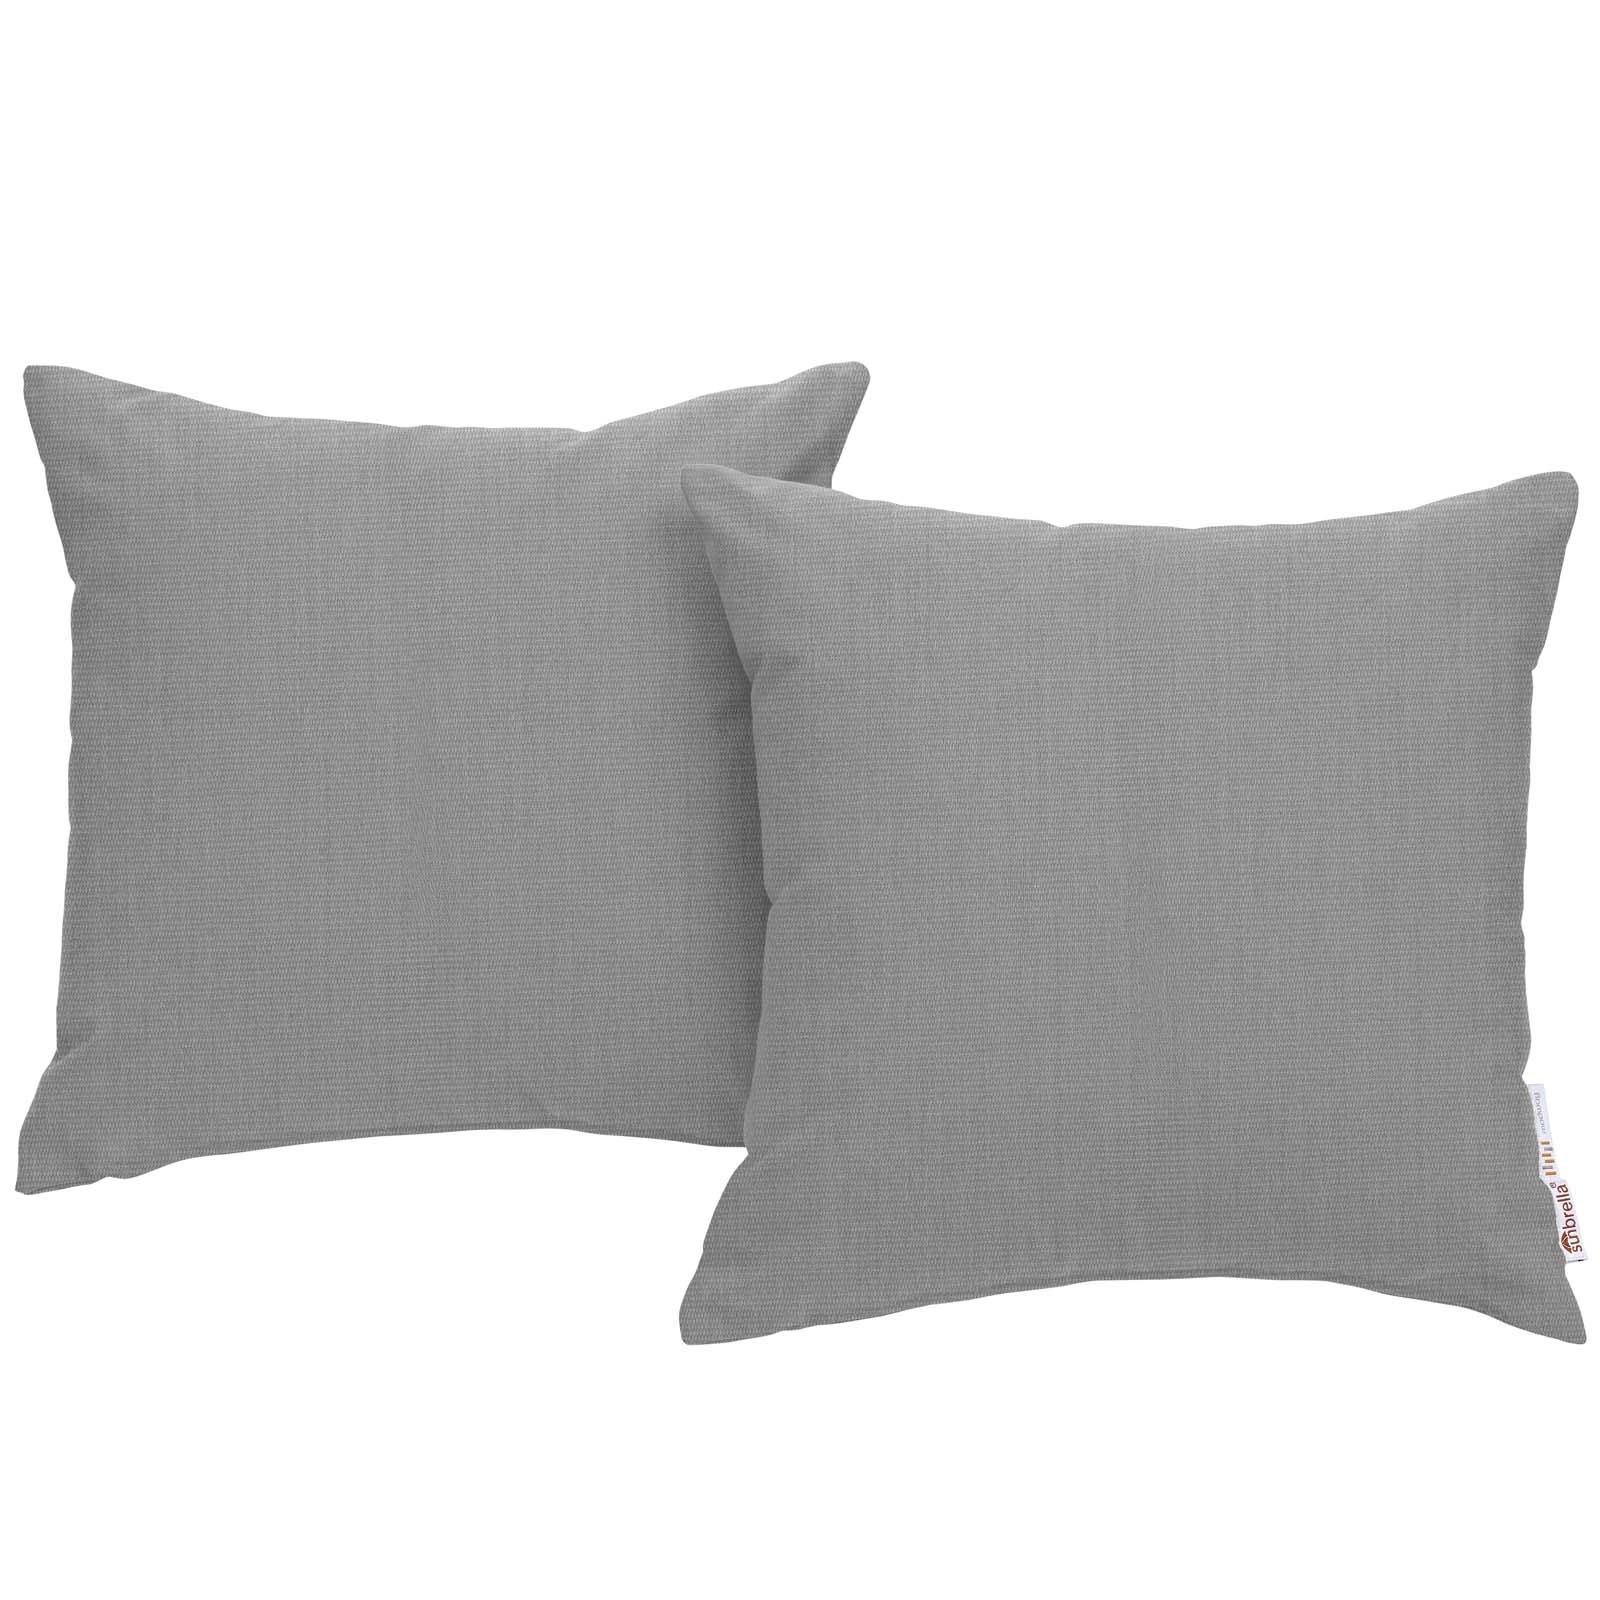 Modway EEI-2002-GRY (2 Piece) Outdoor Patio Pillow Set, Gray